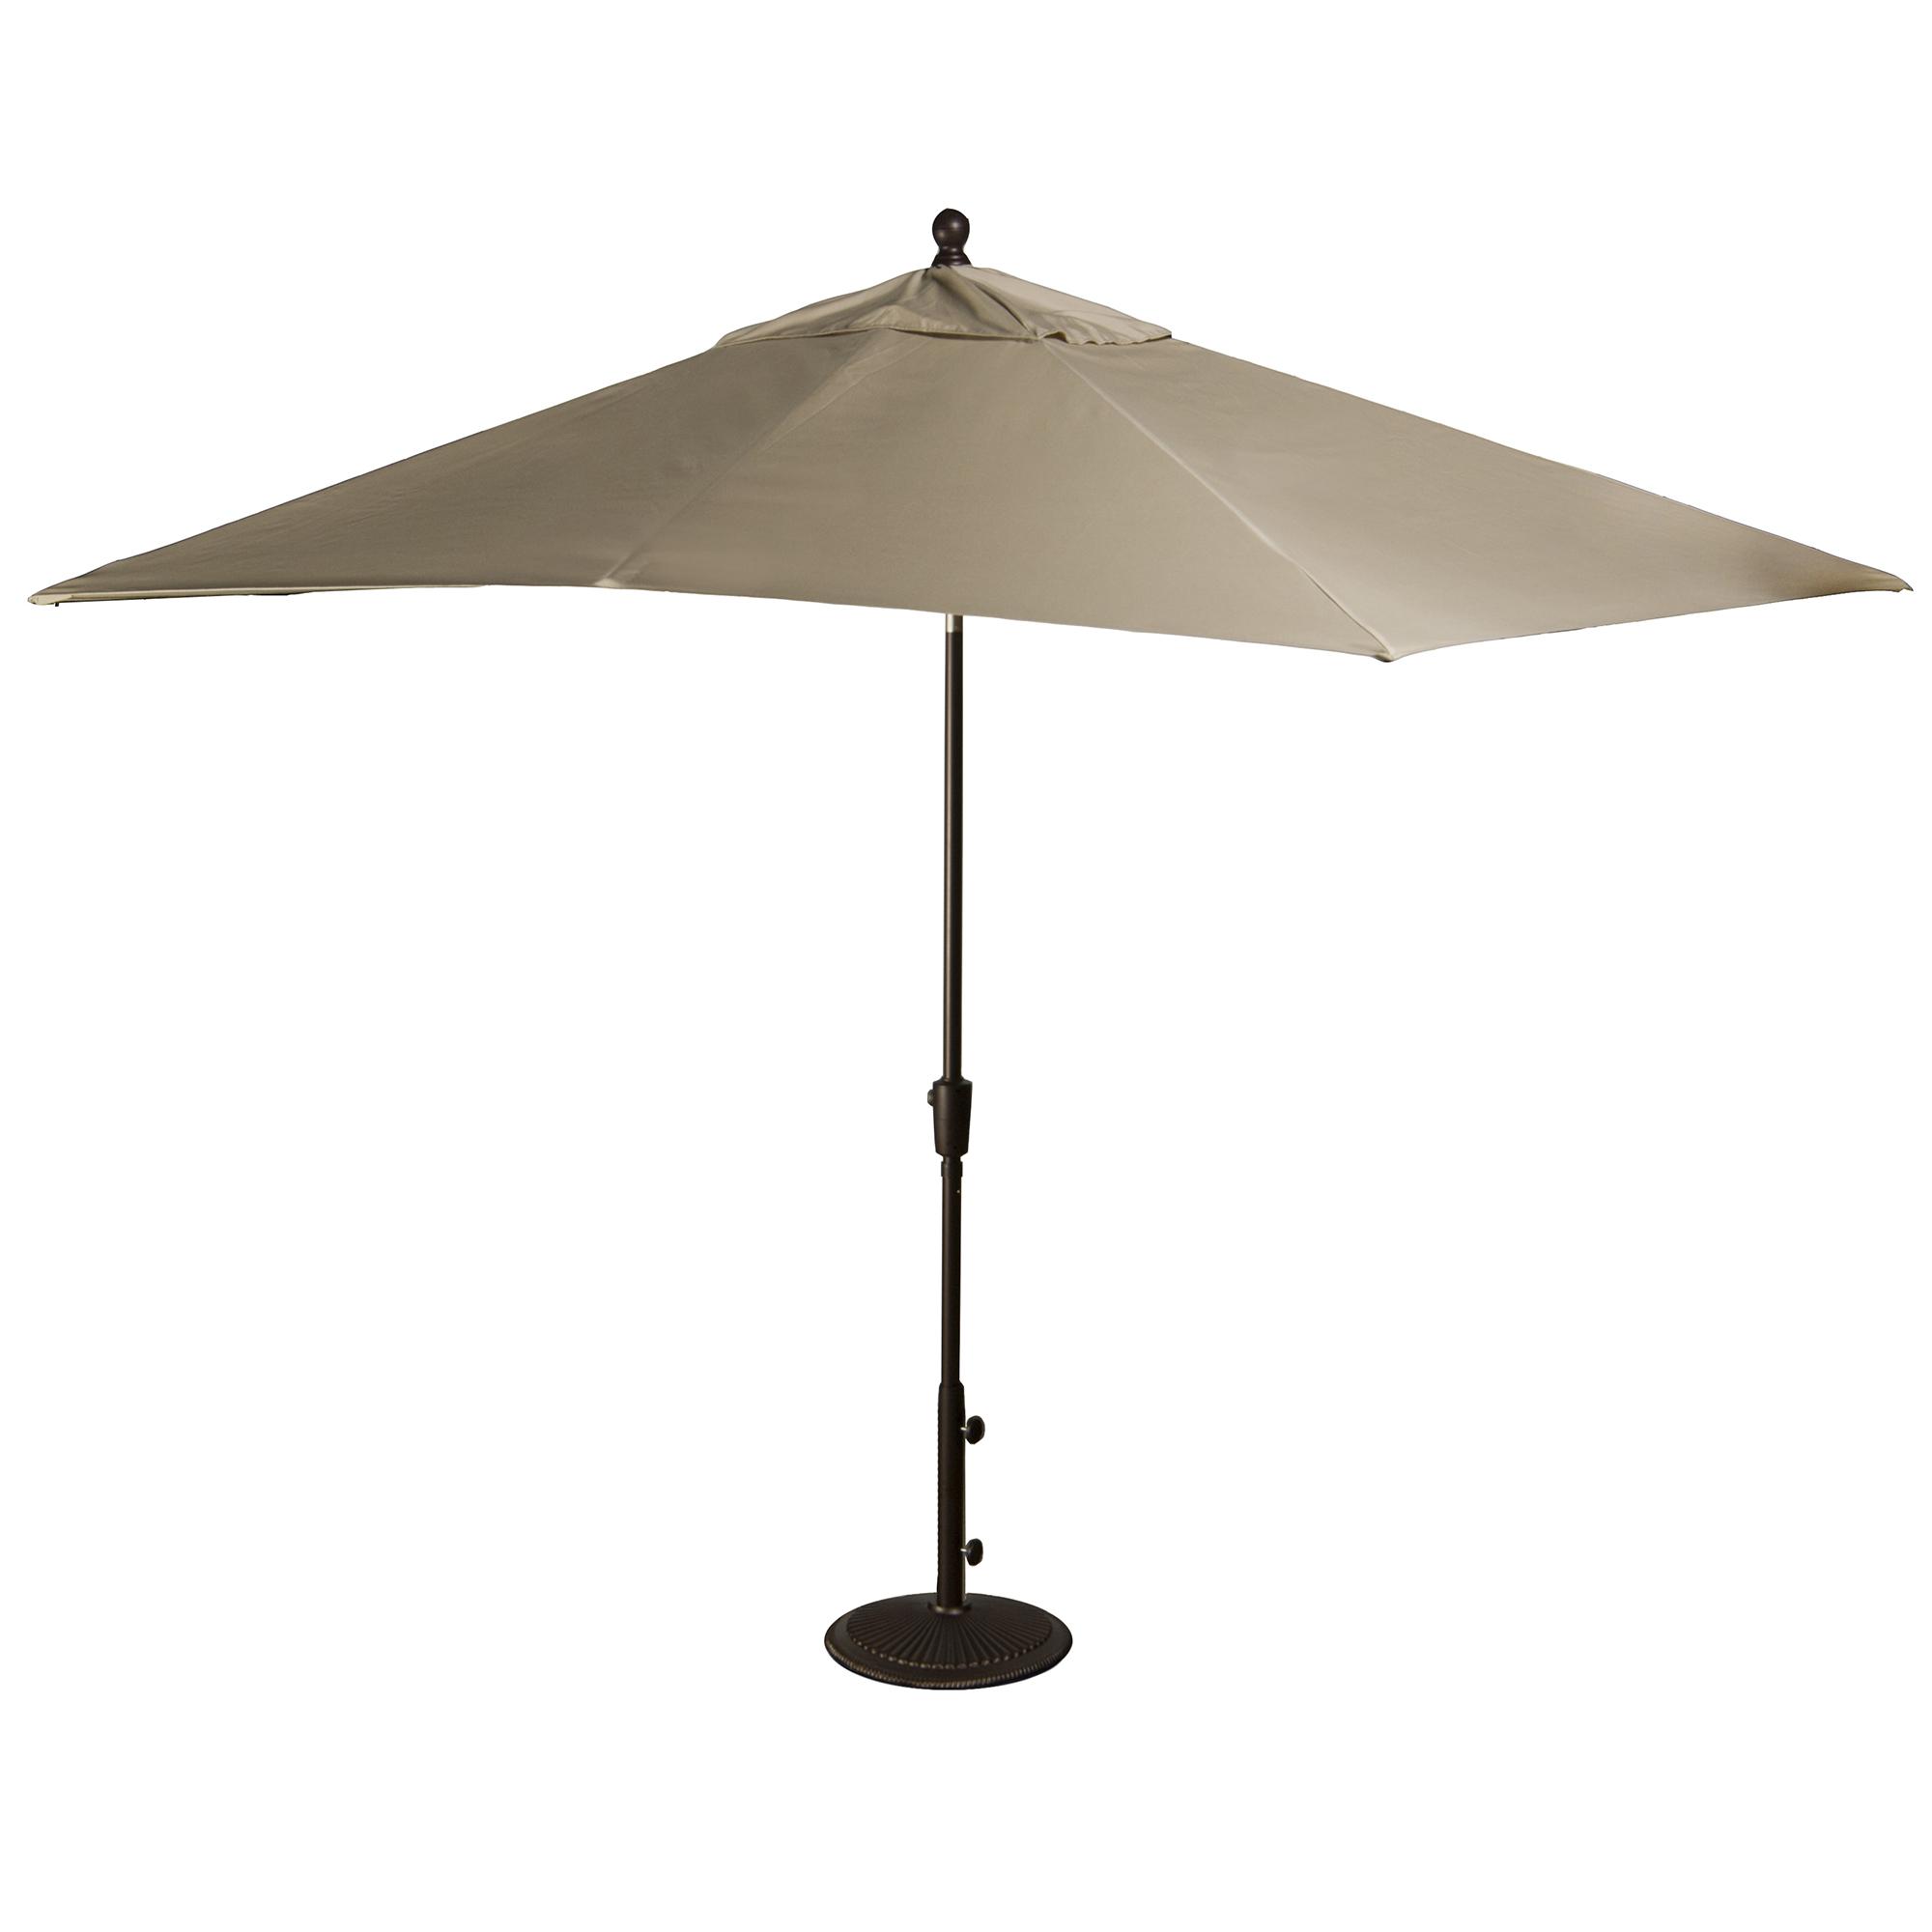 Patio Umbrella Alternative: Island Umbrella Caspian 8-ft X 10-ft Rectangular Market